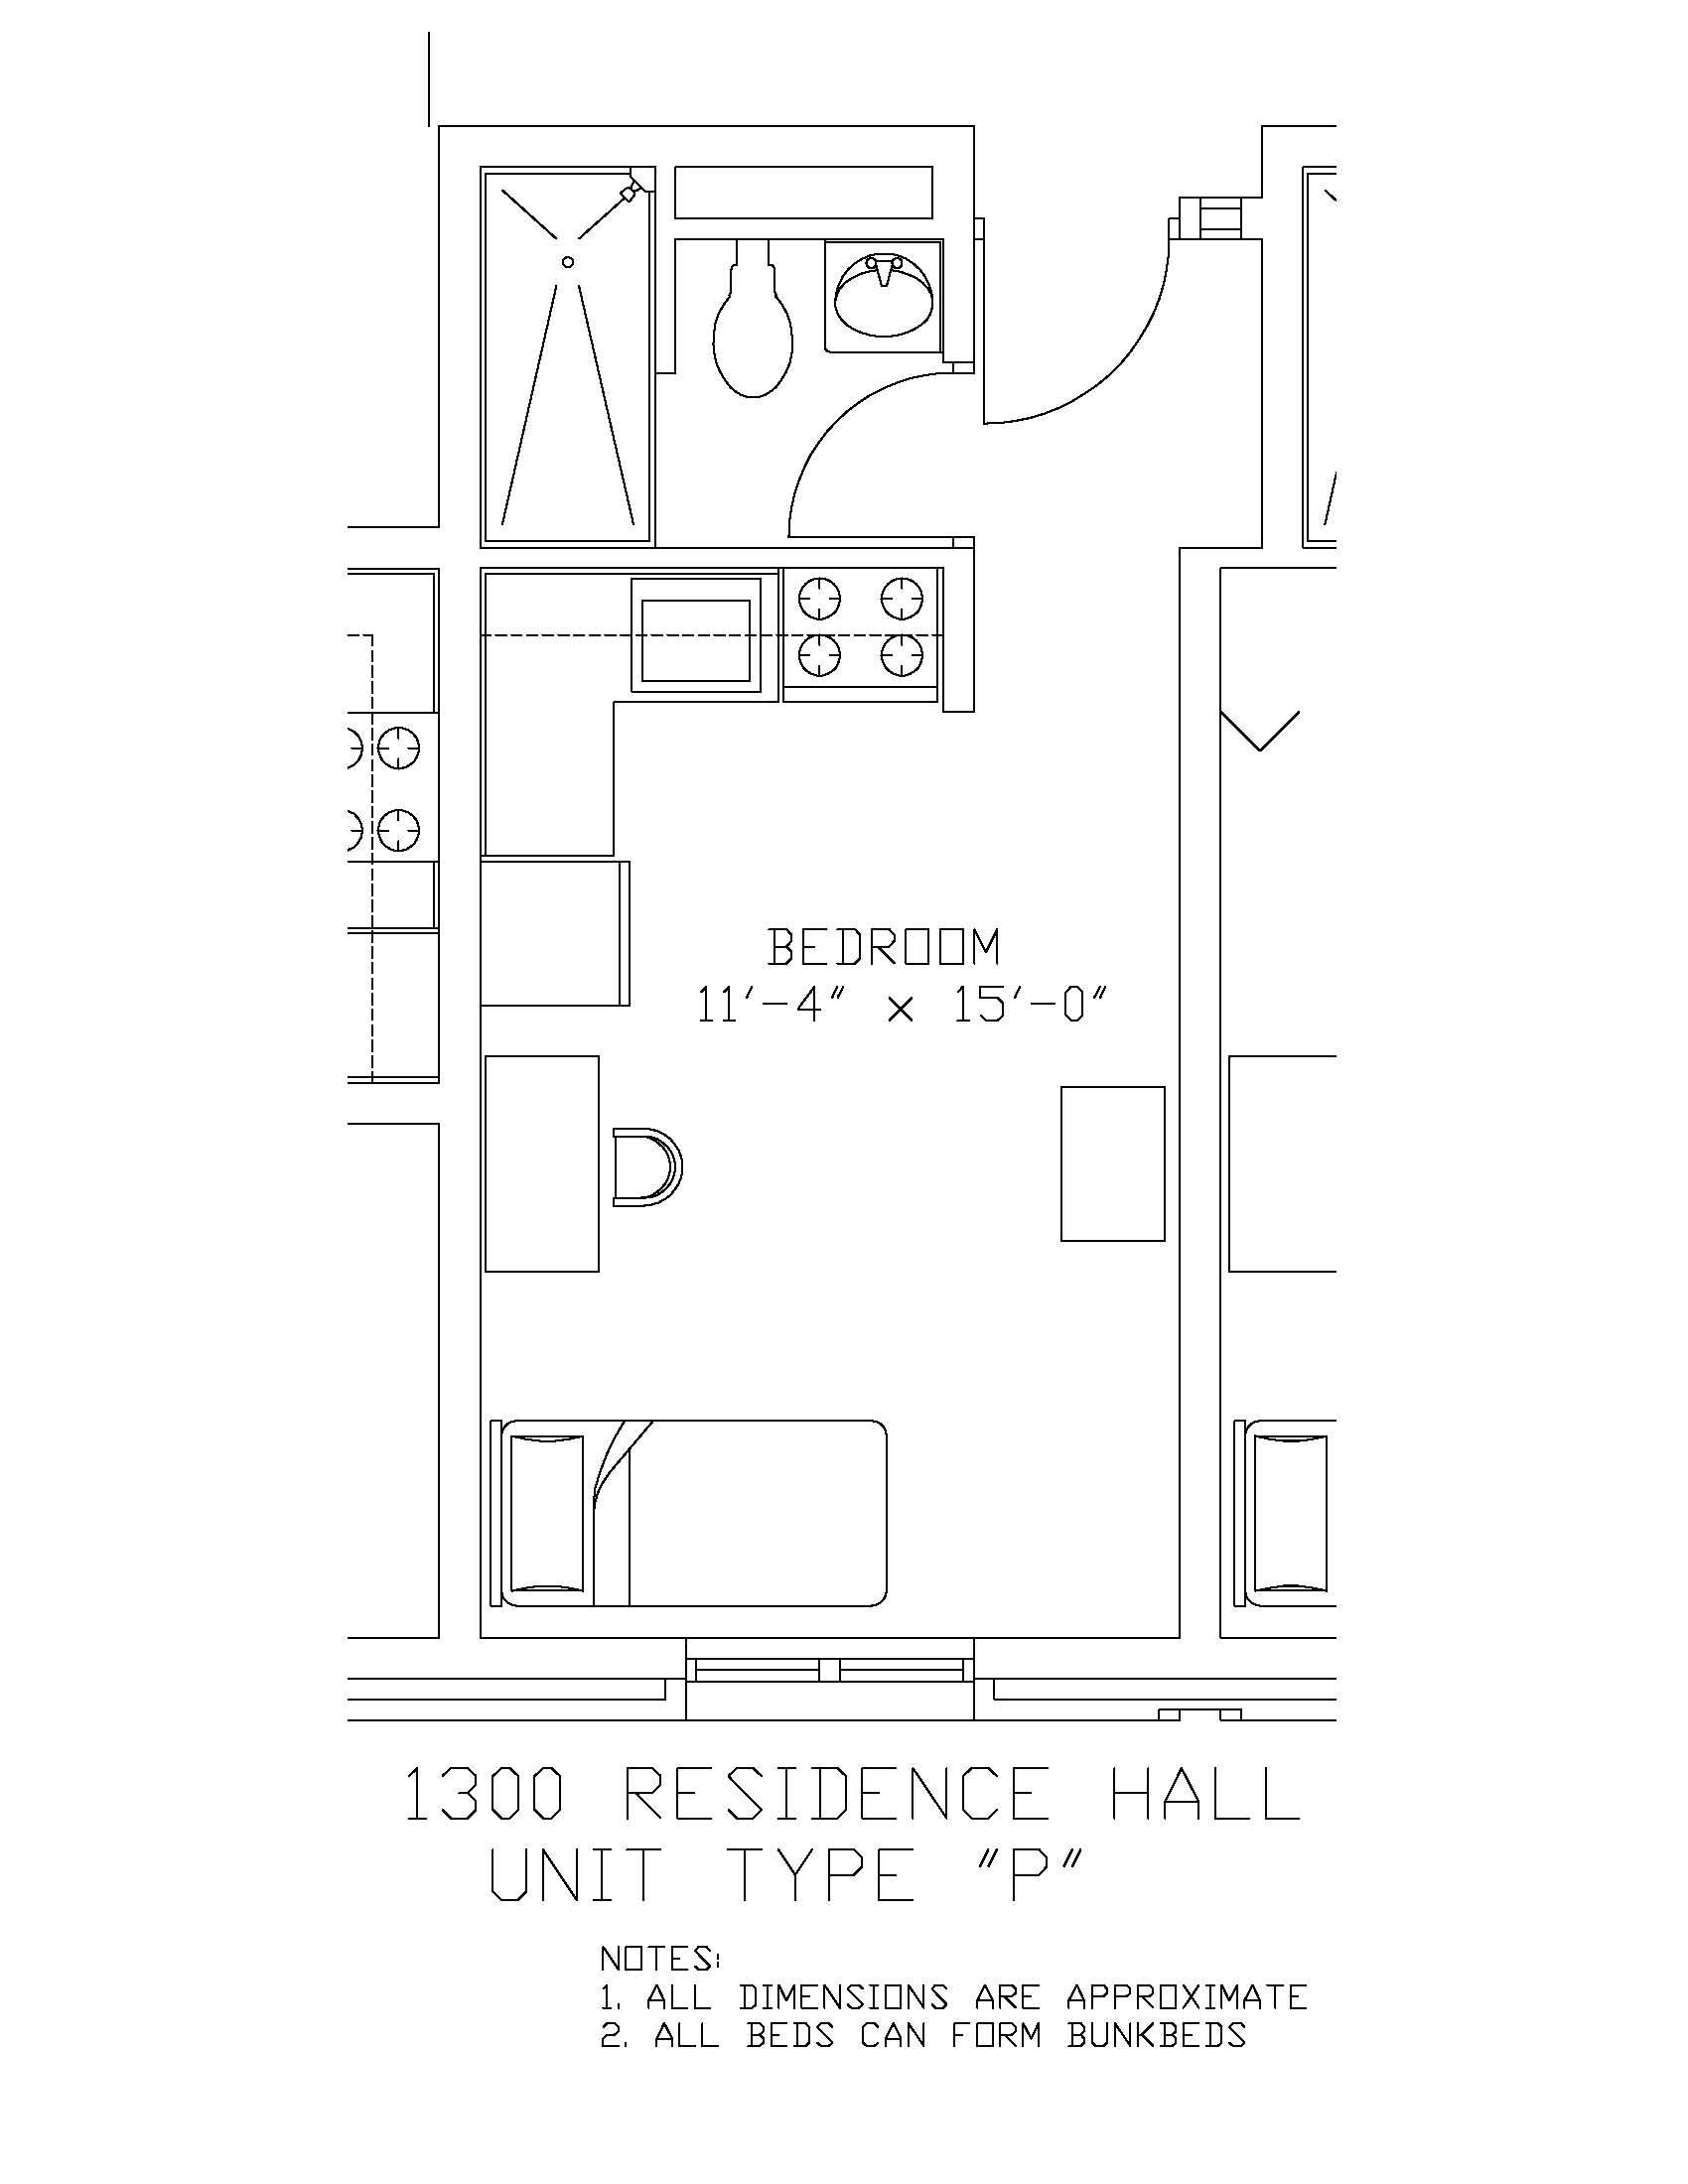 1300 Residence Hall: Type P